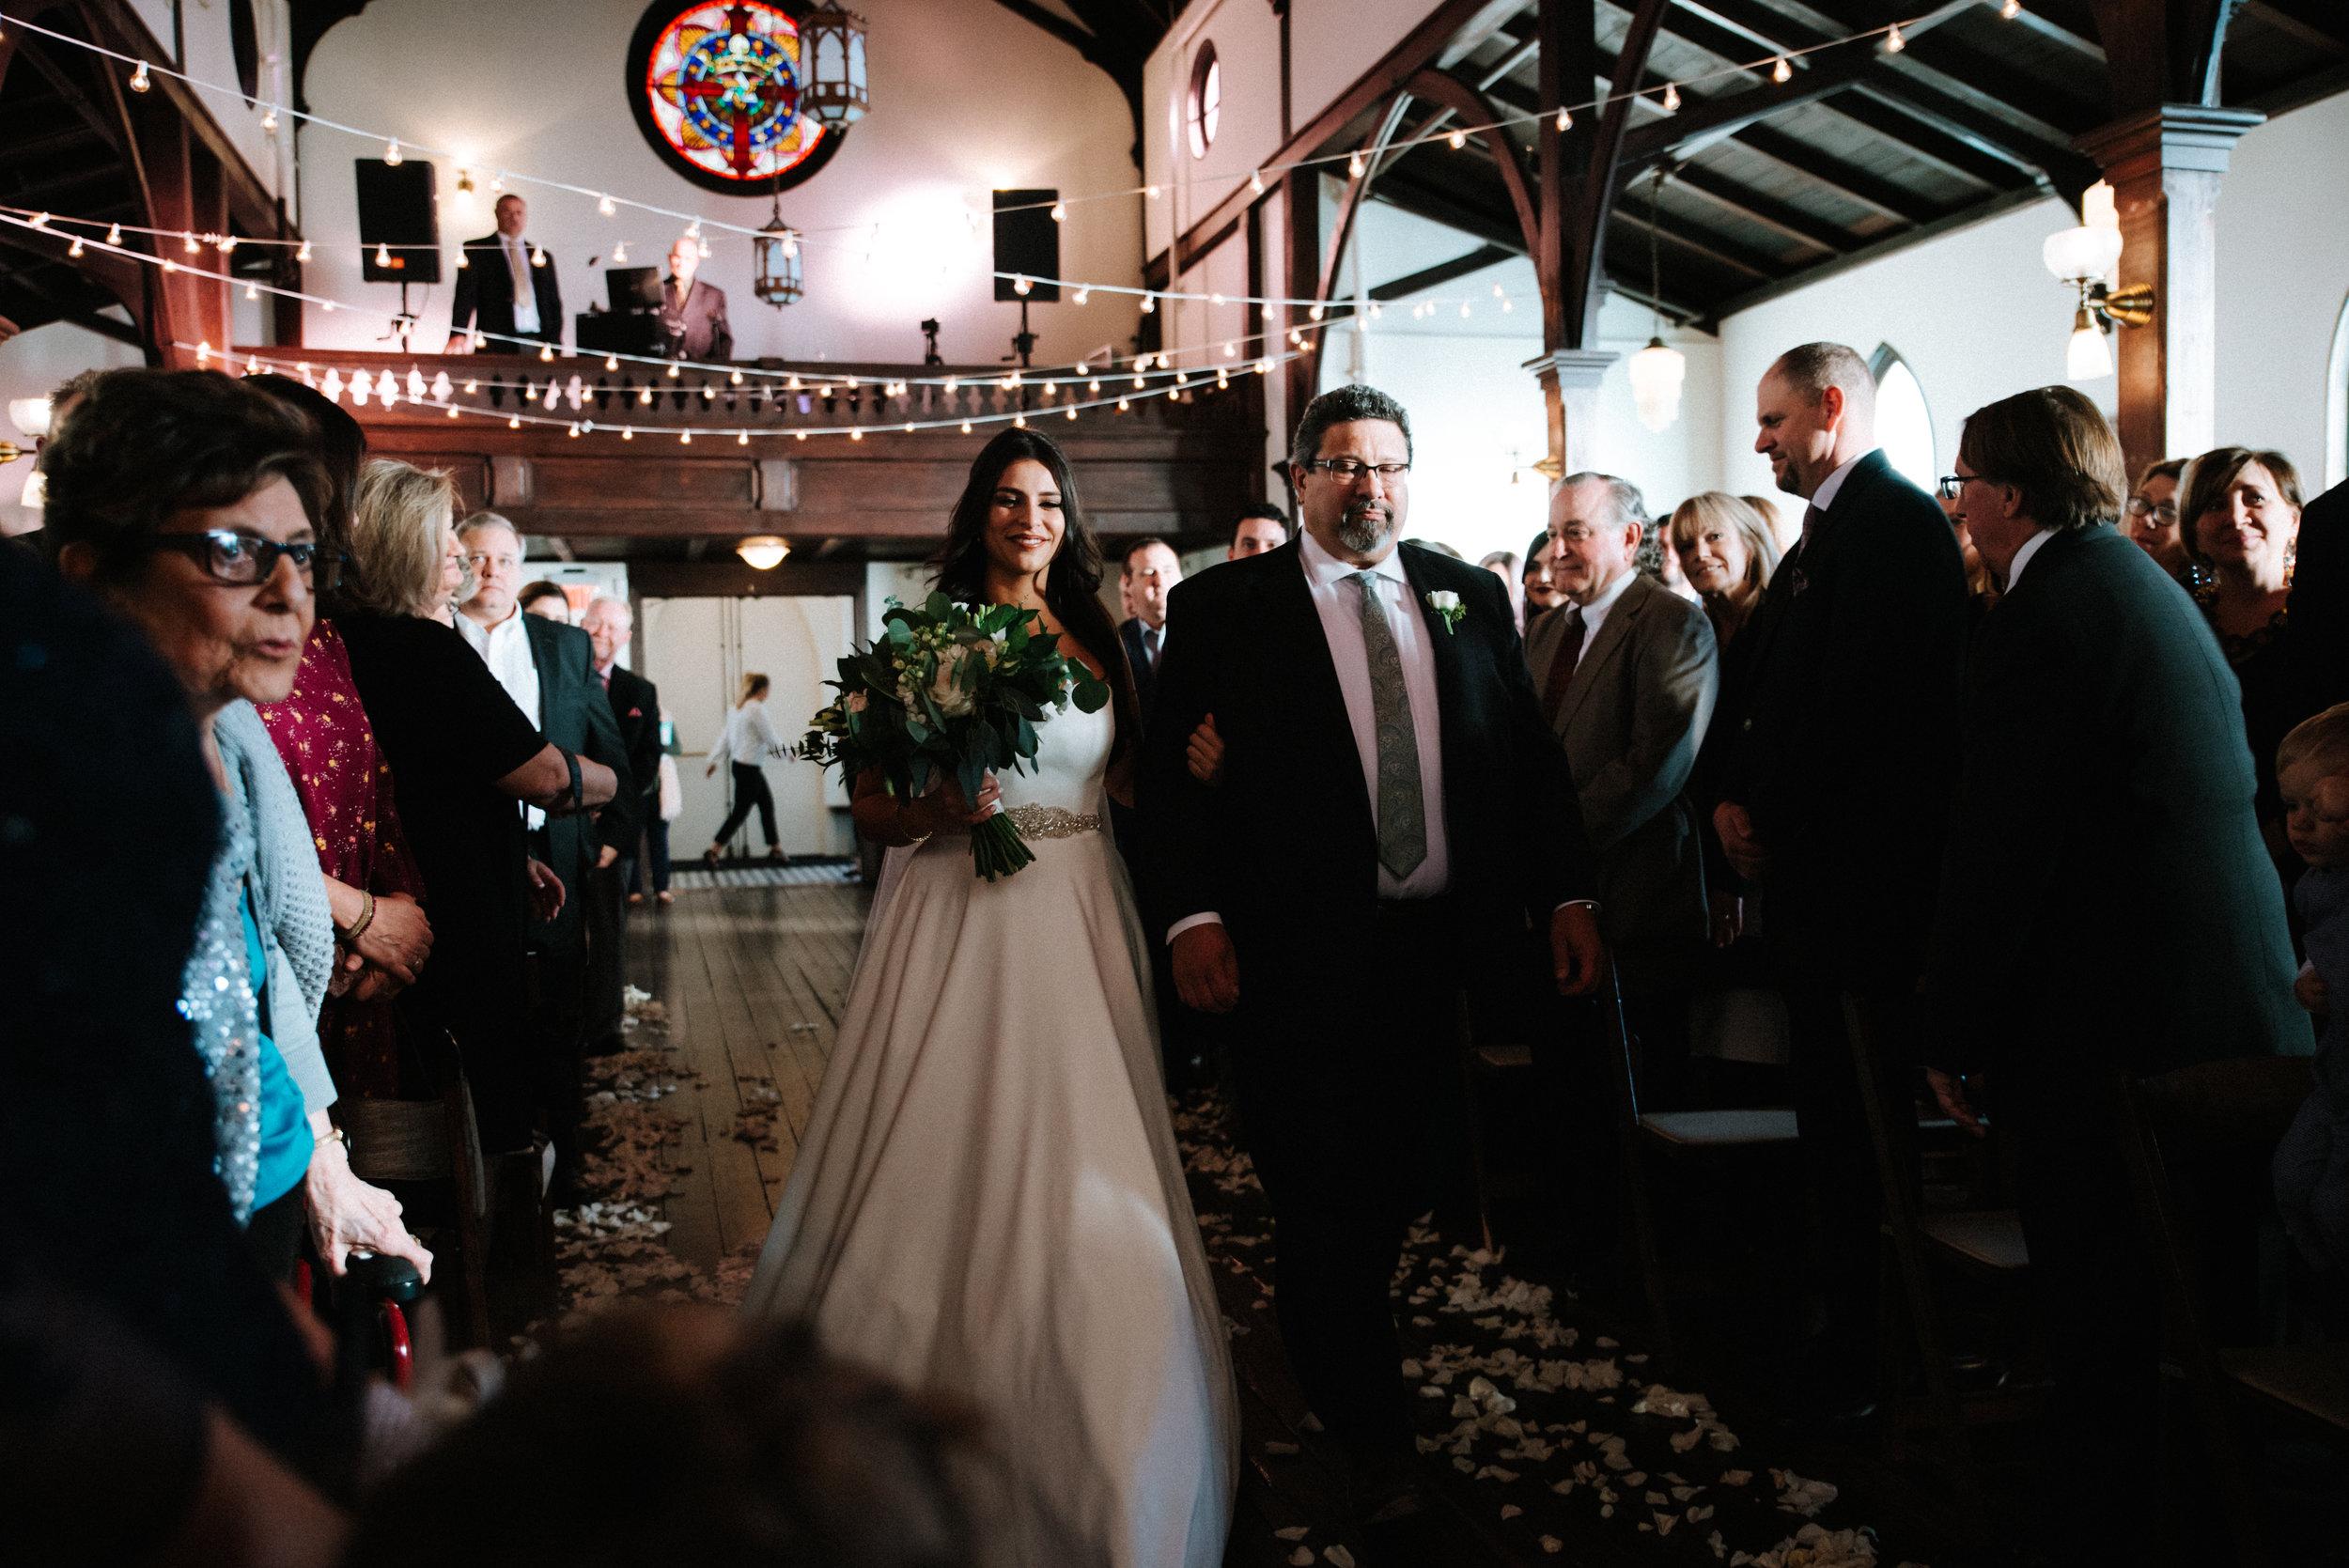 +Raleigh Wedding +North Carolina +Photographer +Wedding Photographer +Engagement Photographer +All Saints Chapel-6732.jpg